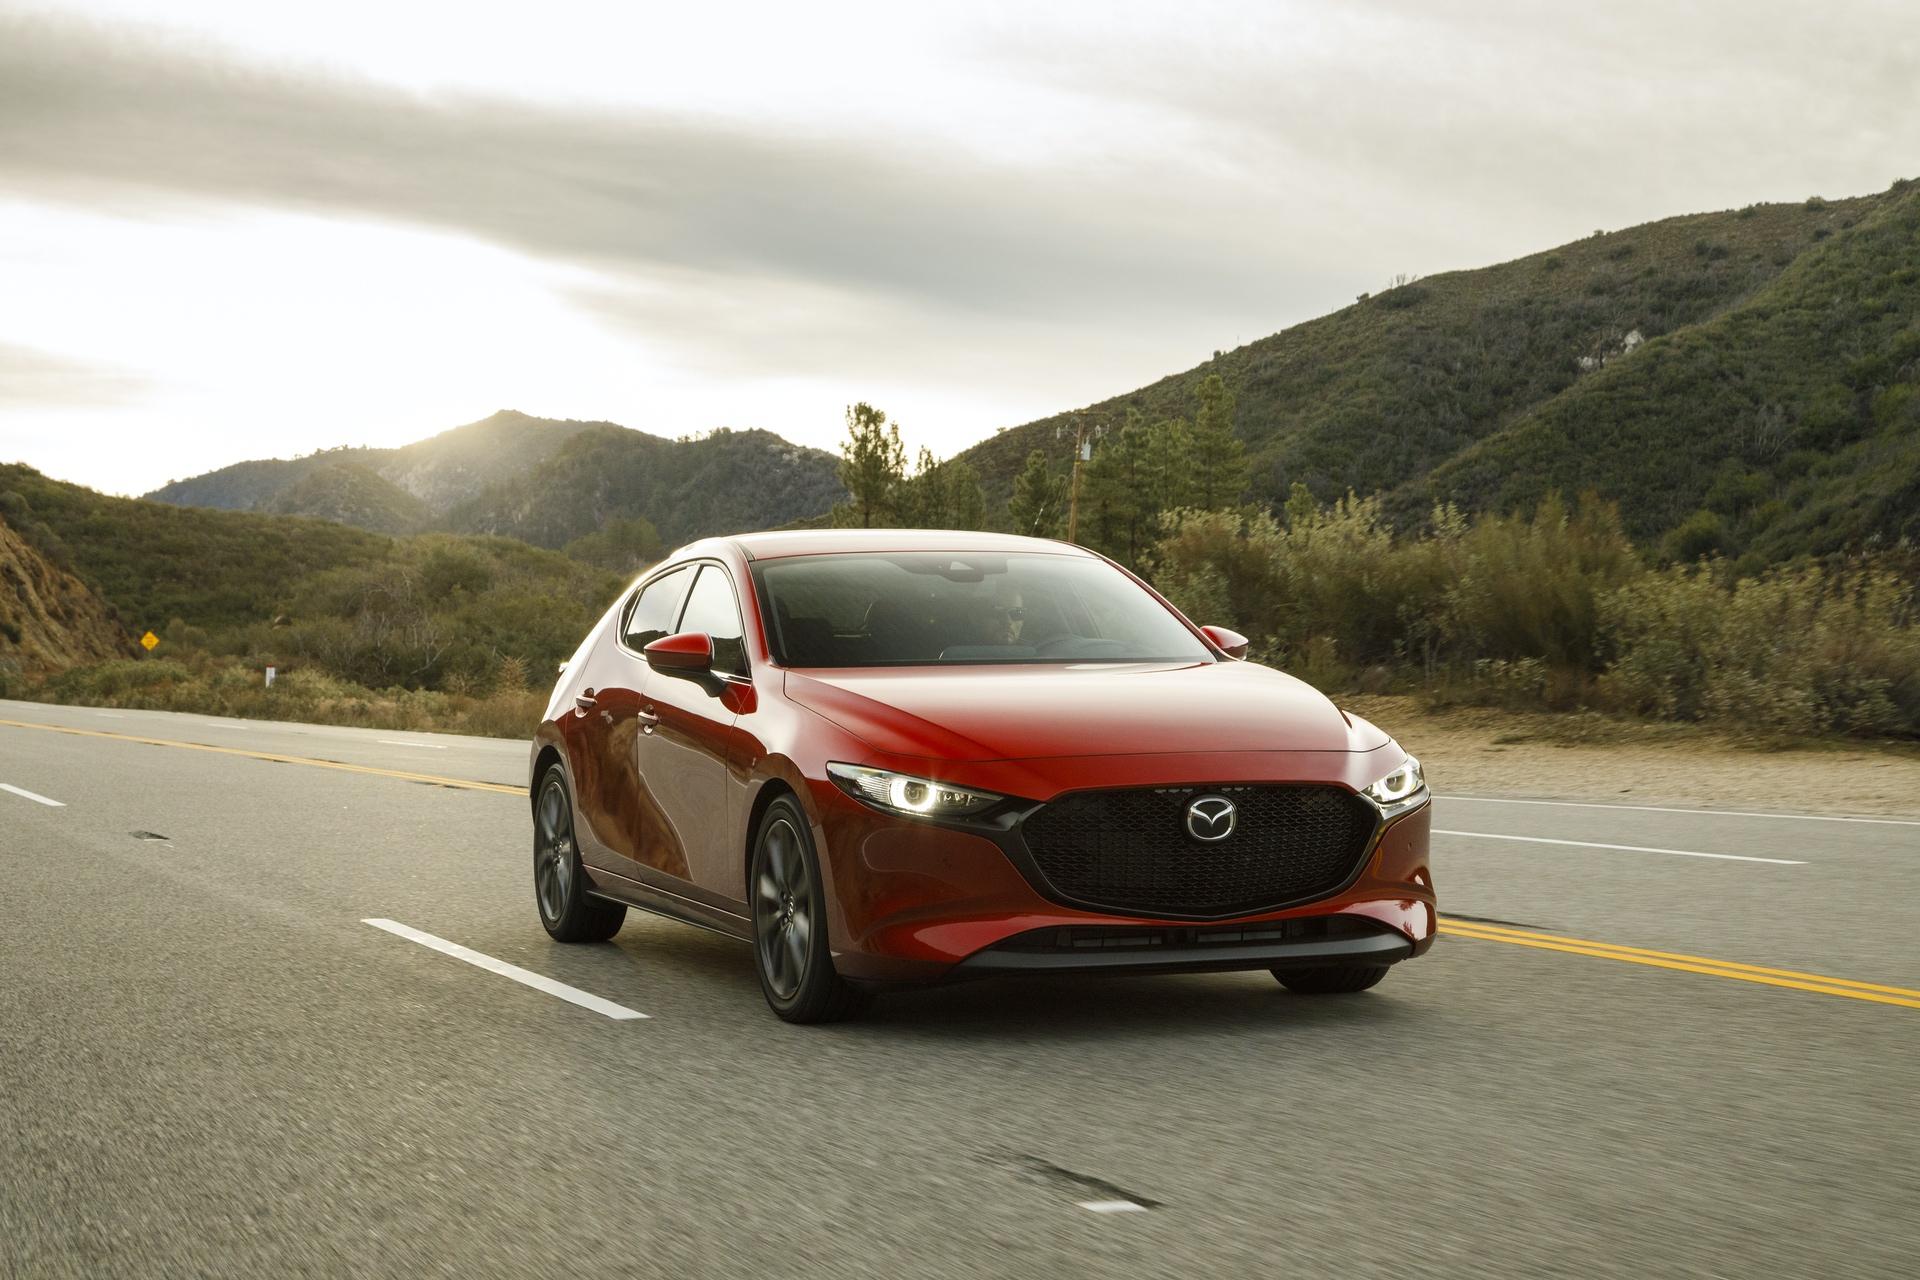 2019-Mazda3-Hatchback_13